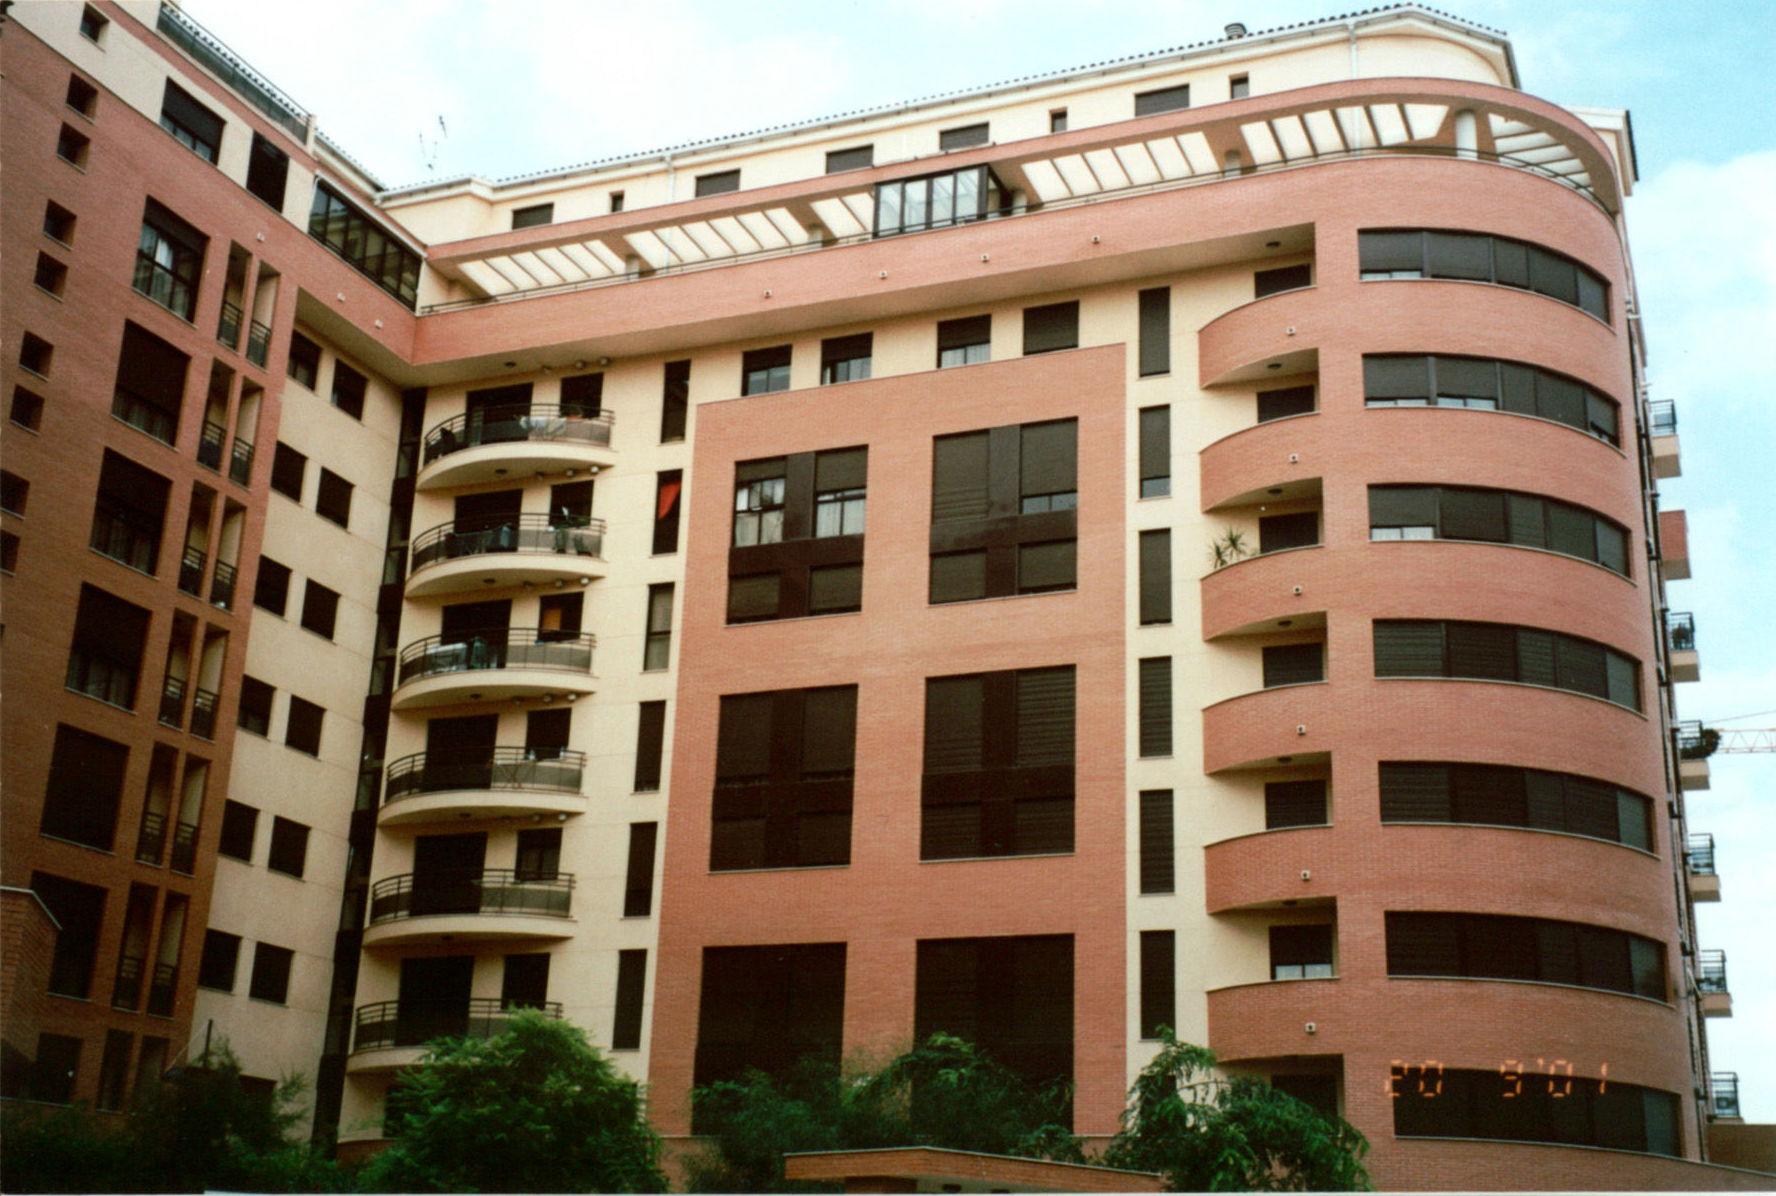 Construcción de Edificio Viviendas Alina- Cristina Fortanet - Arquitecto